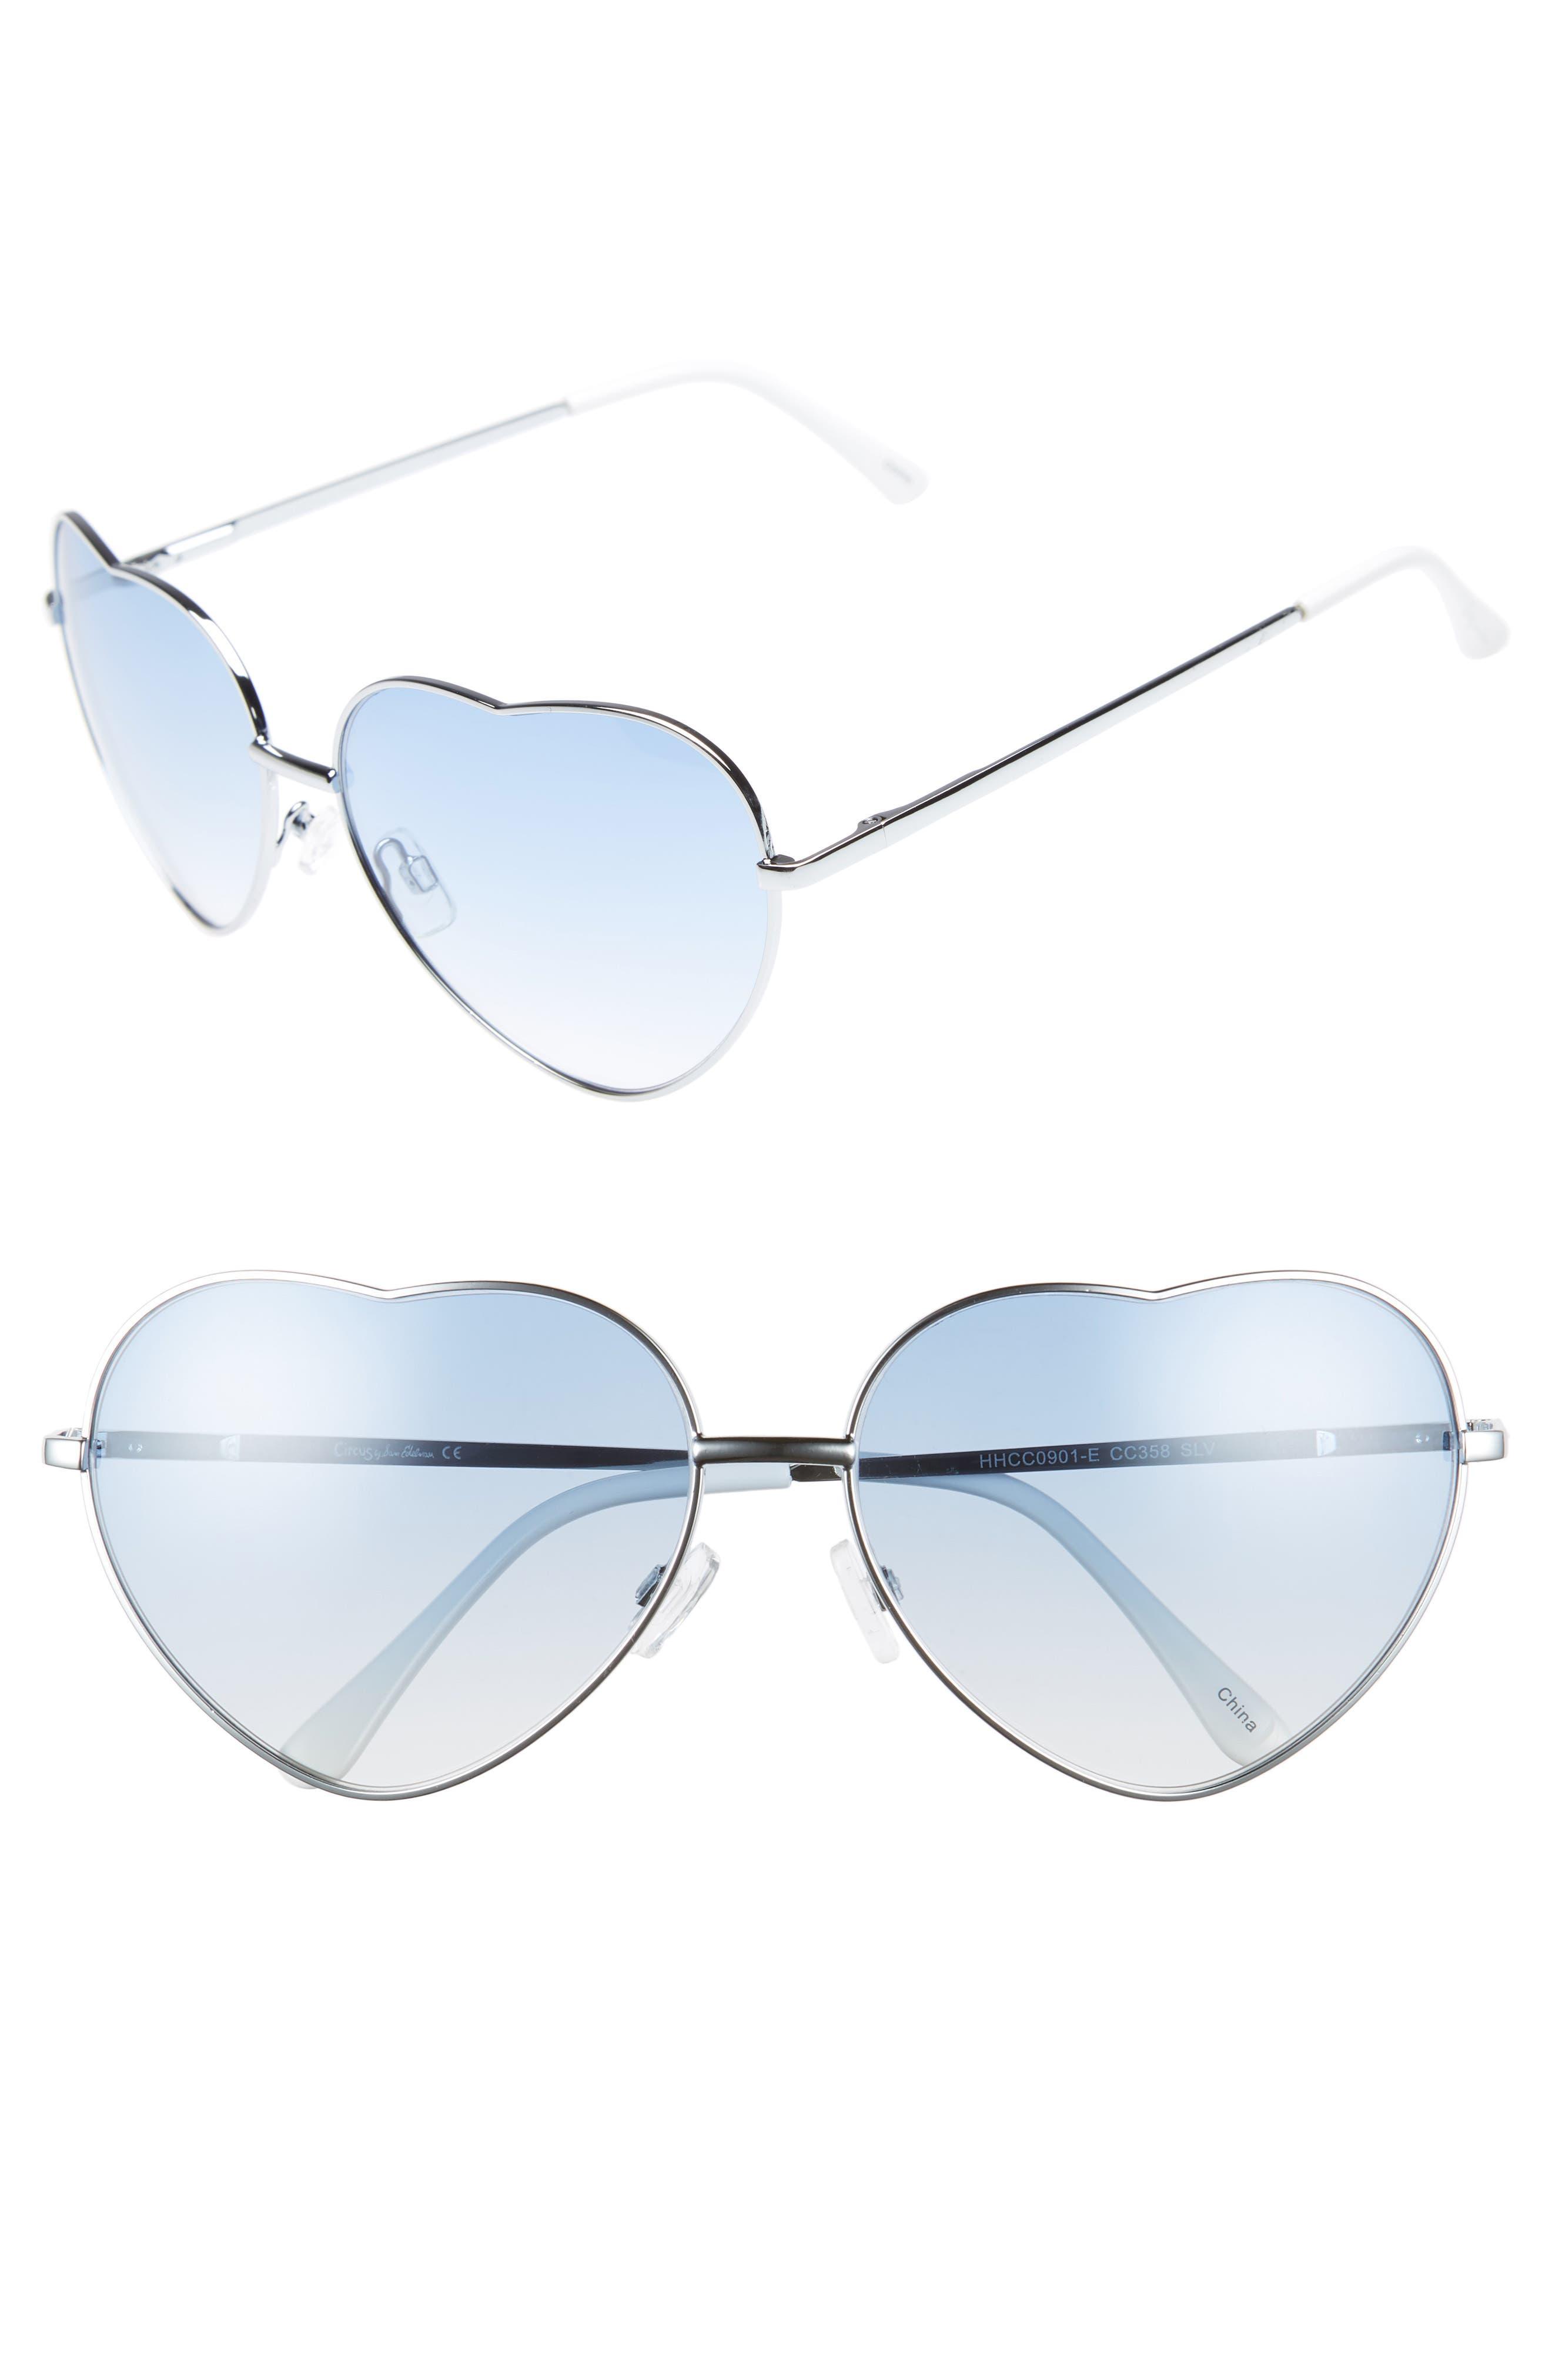 60mm Metal Heart Sunglasses,                         Main,                         color, 040